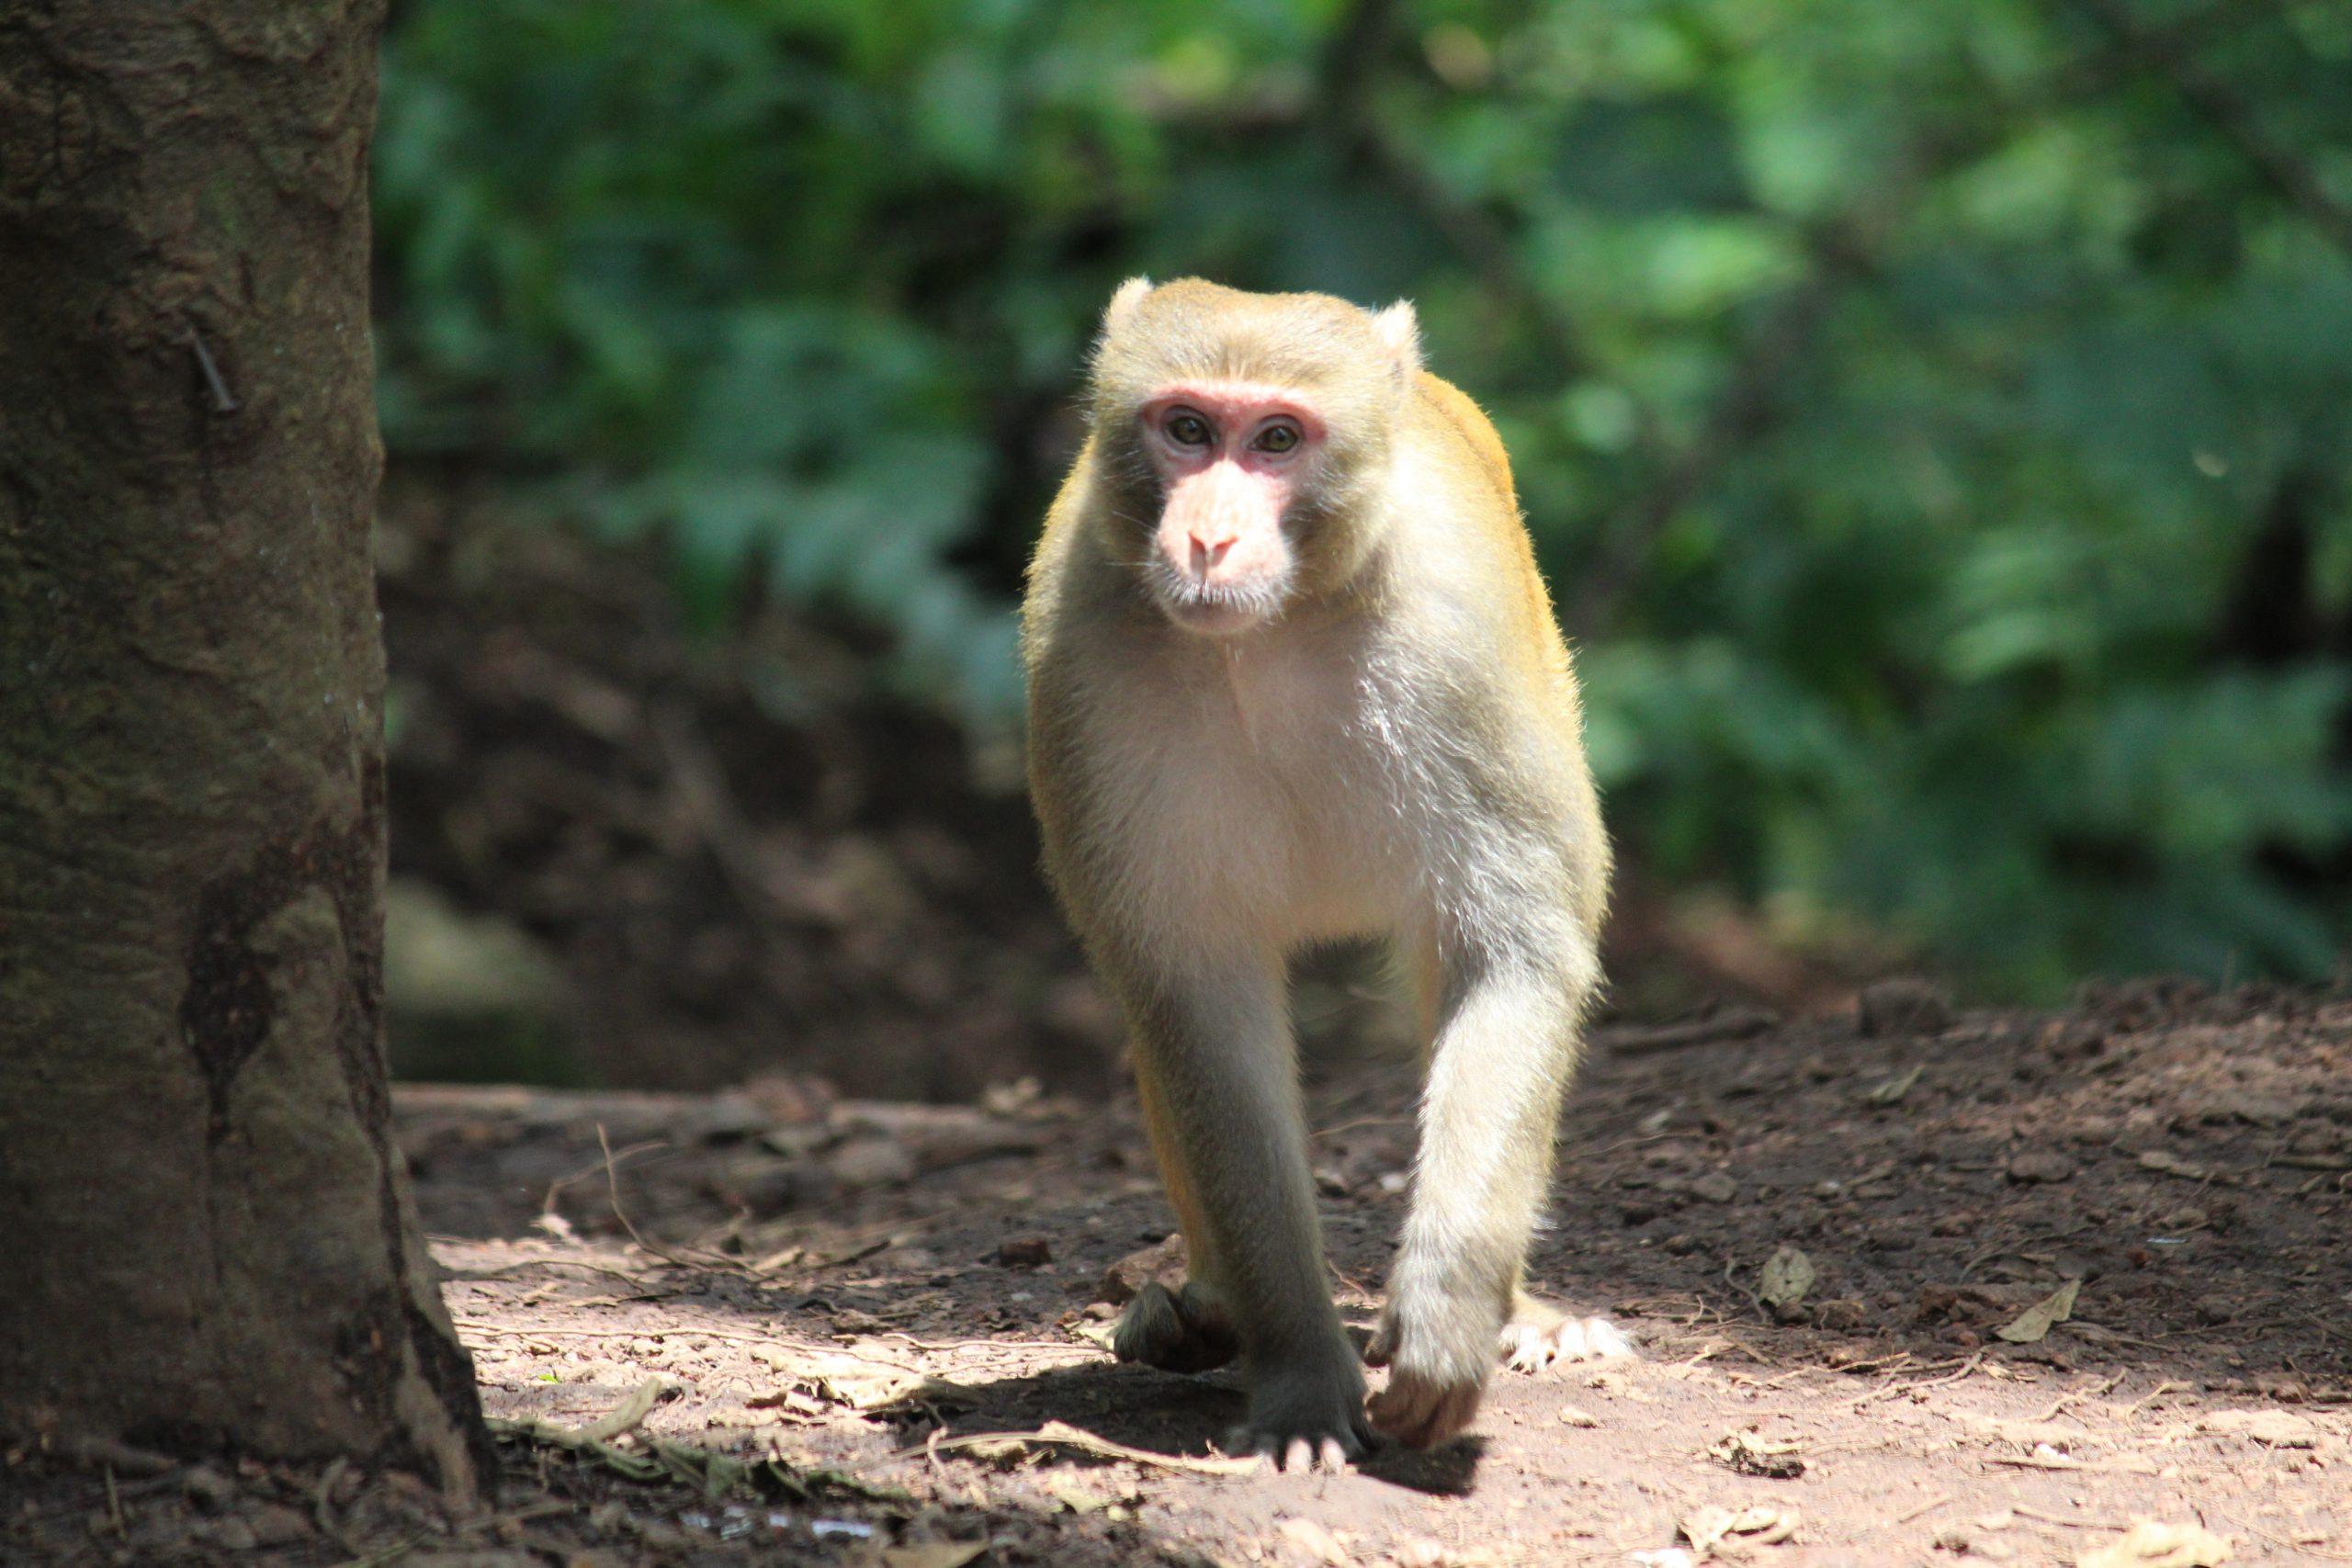 Indian Monkey walking